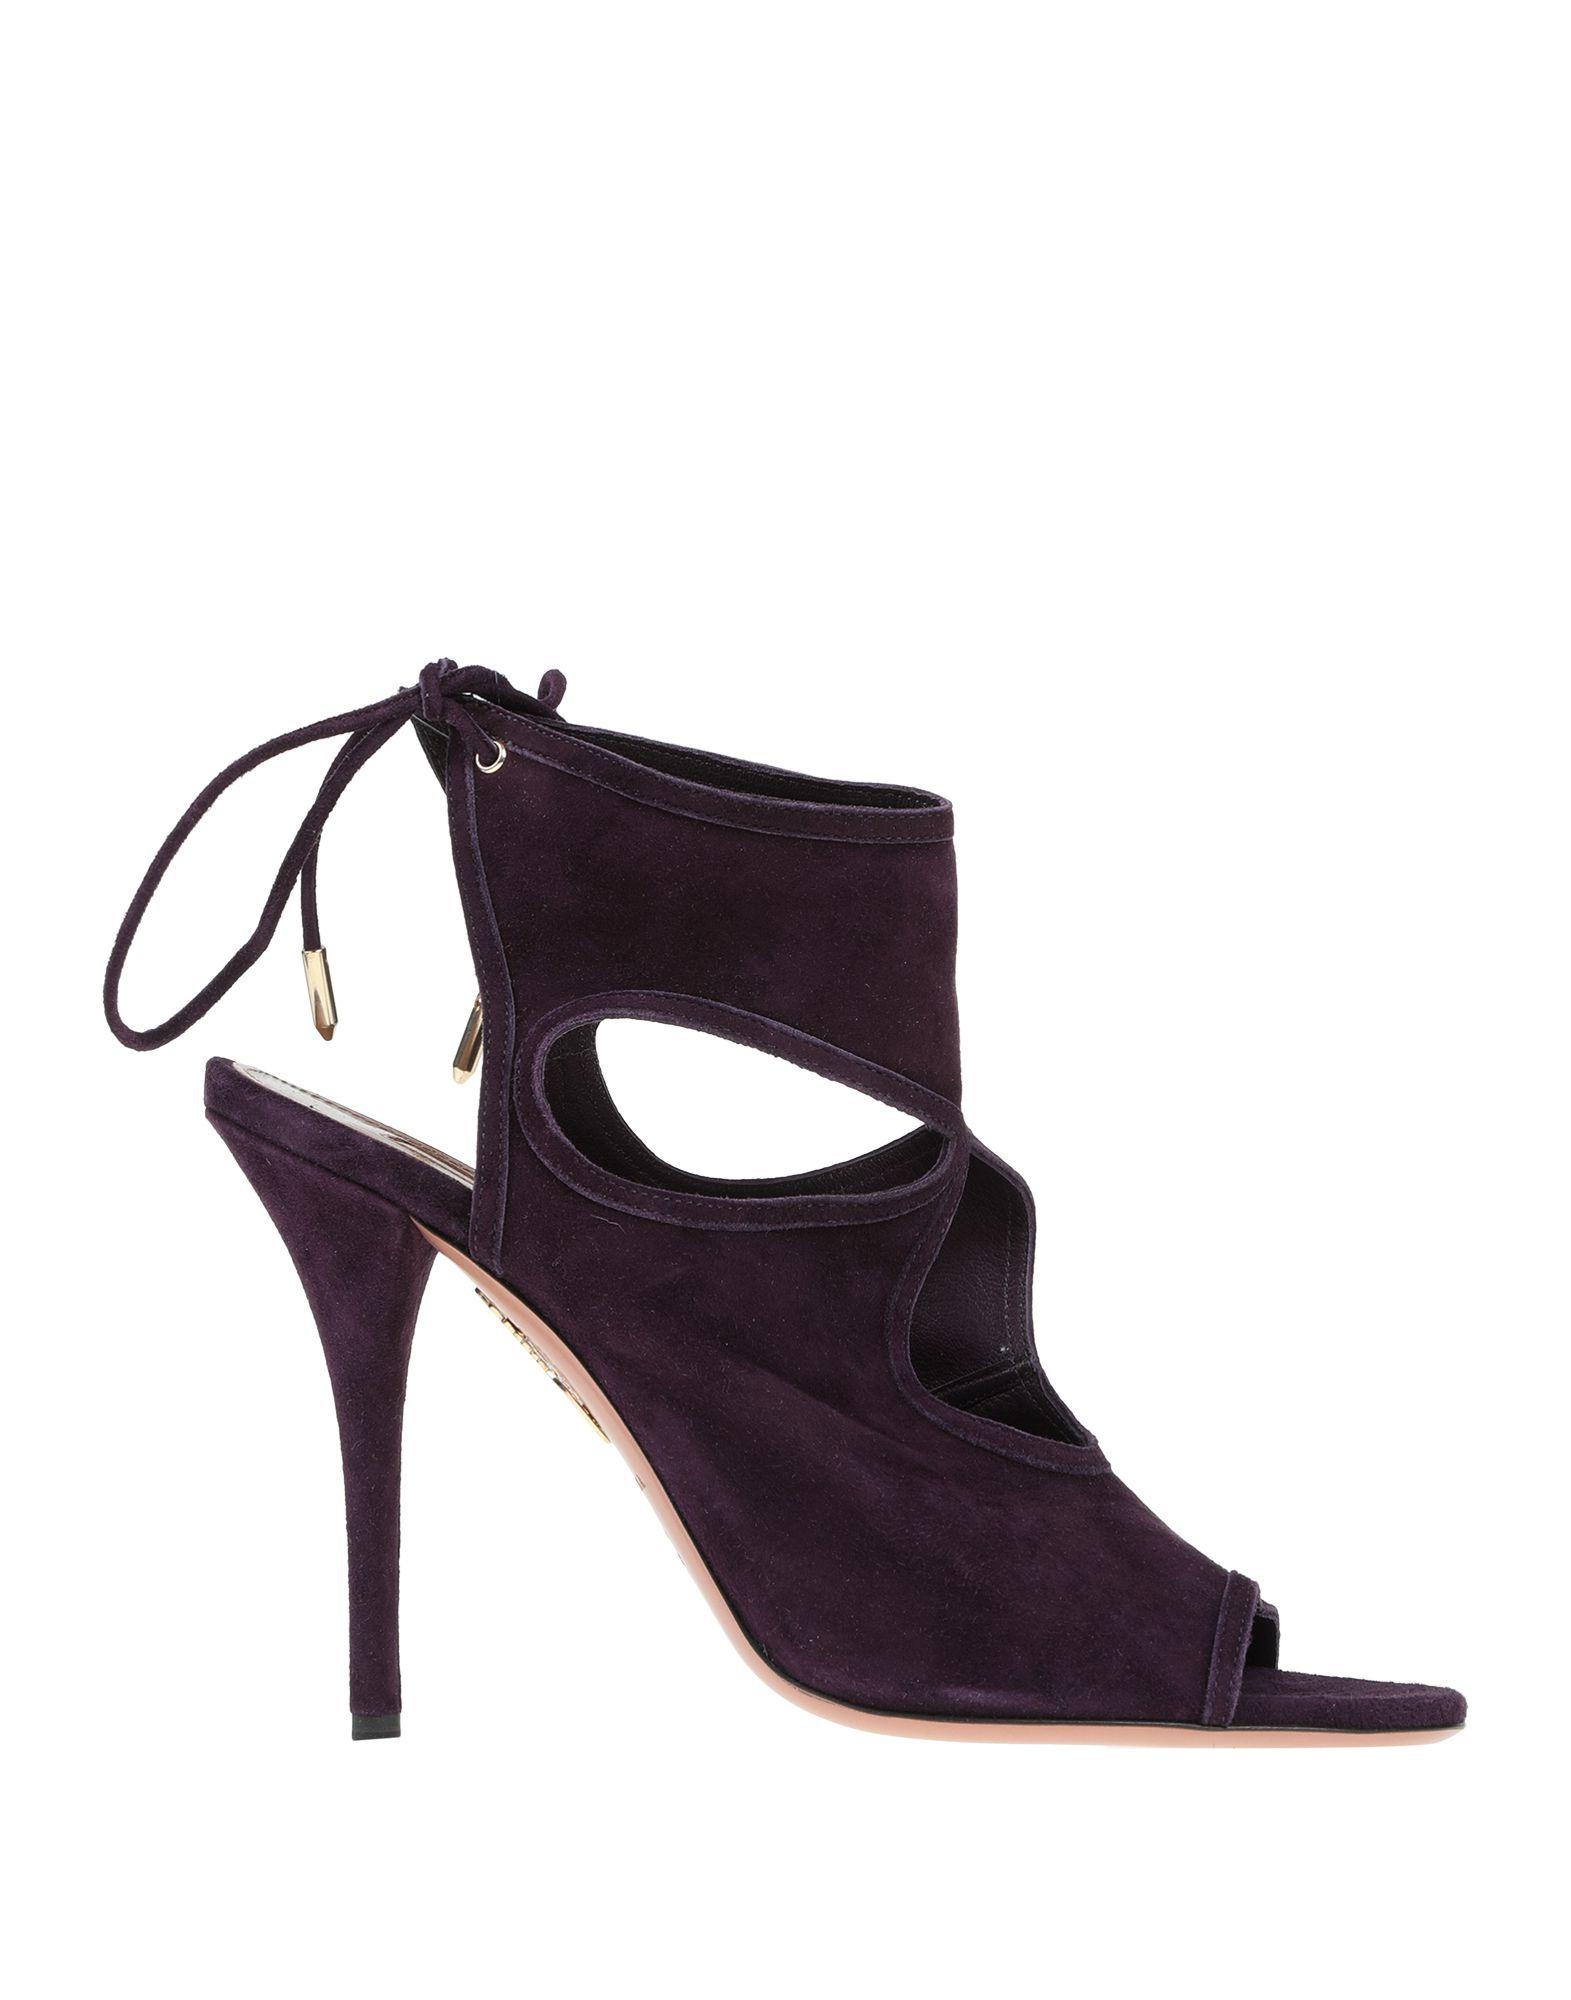 Aquazzura Dark Purple Leather Heels